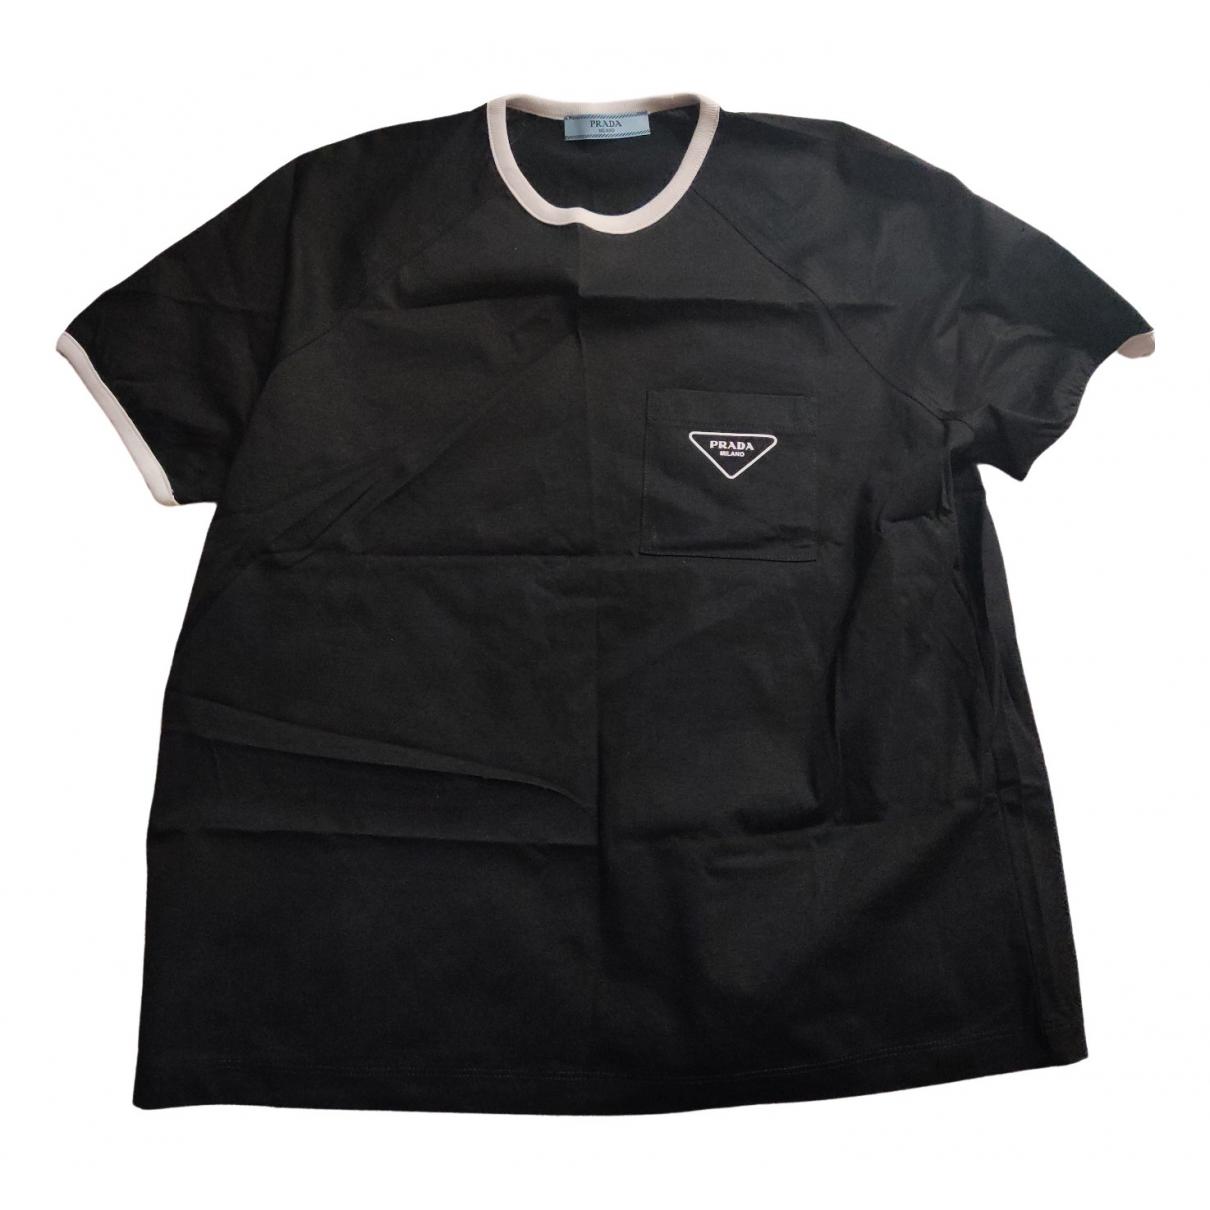 Prada \N Black Cotton  top for Women M International